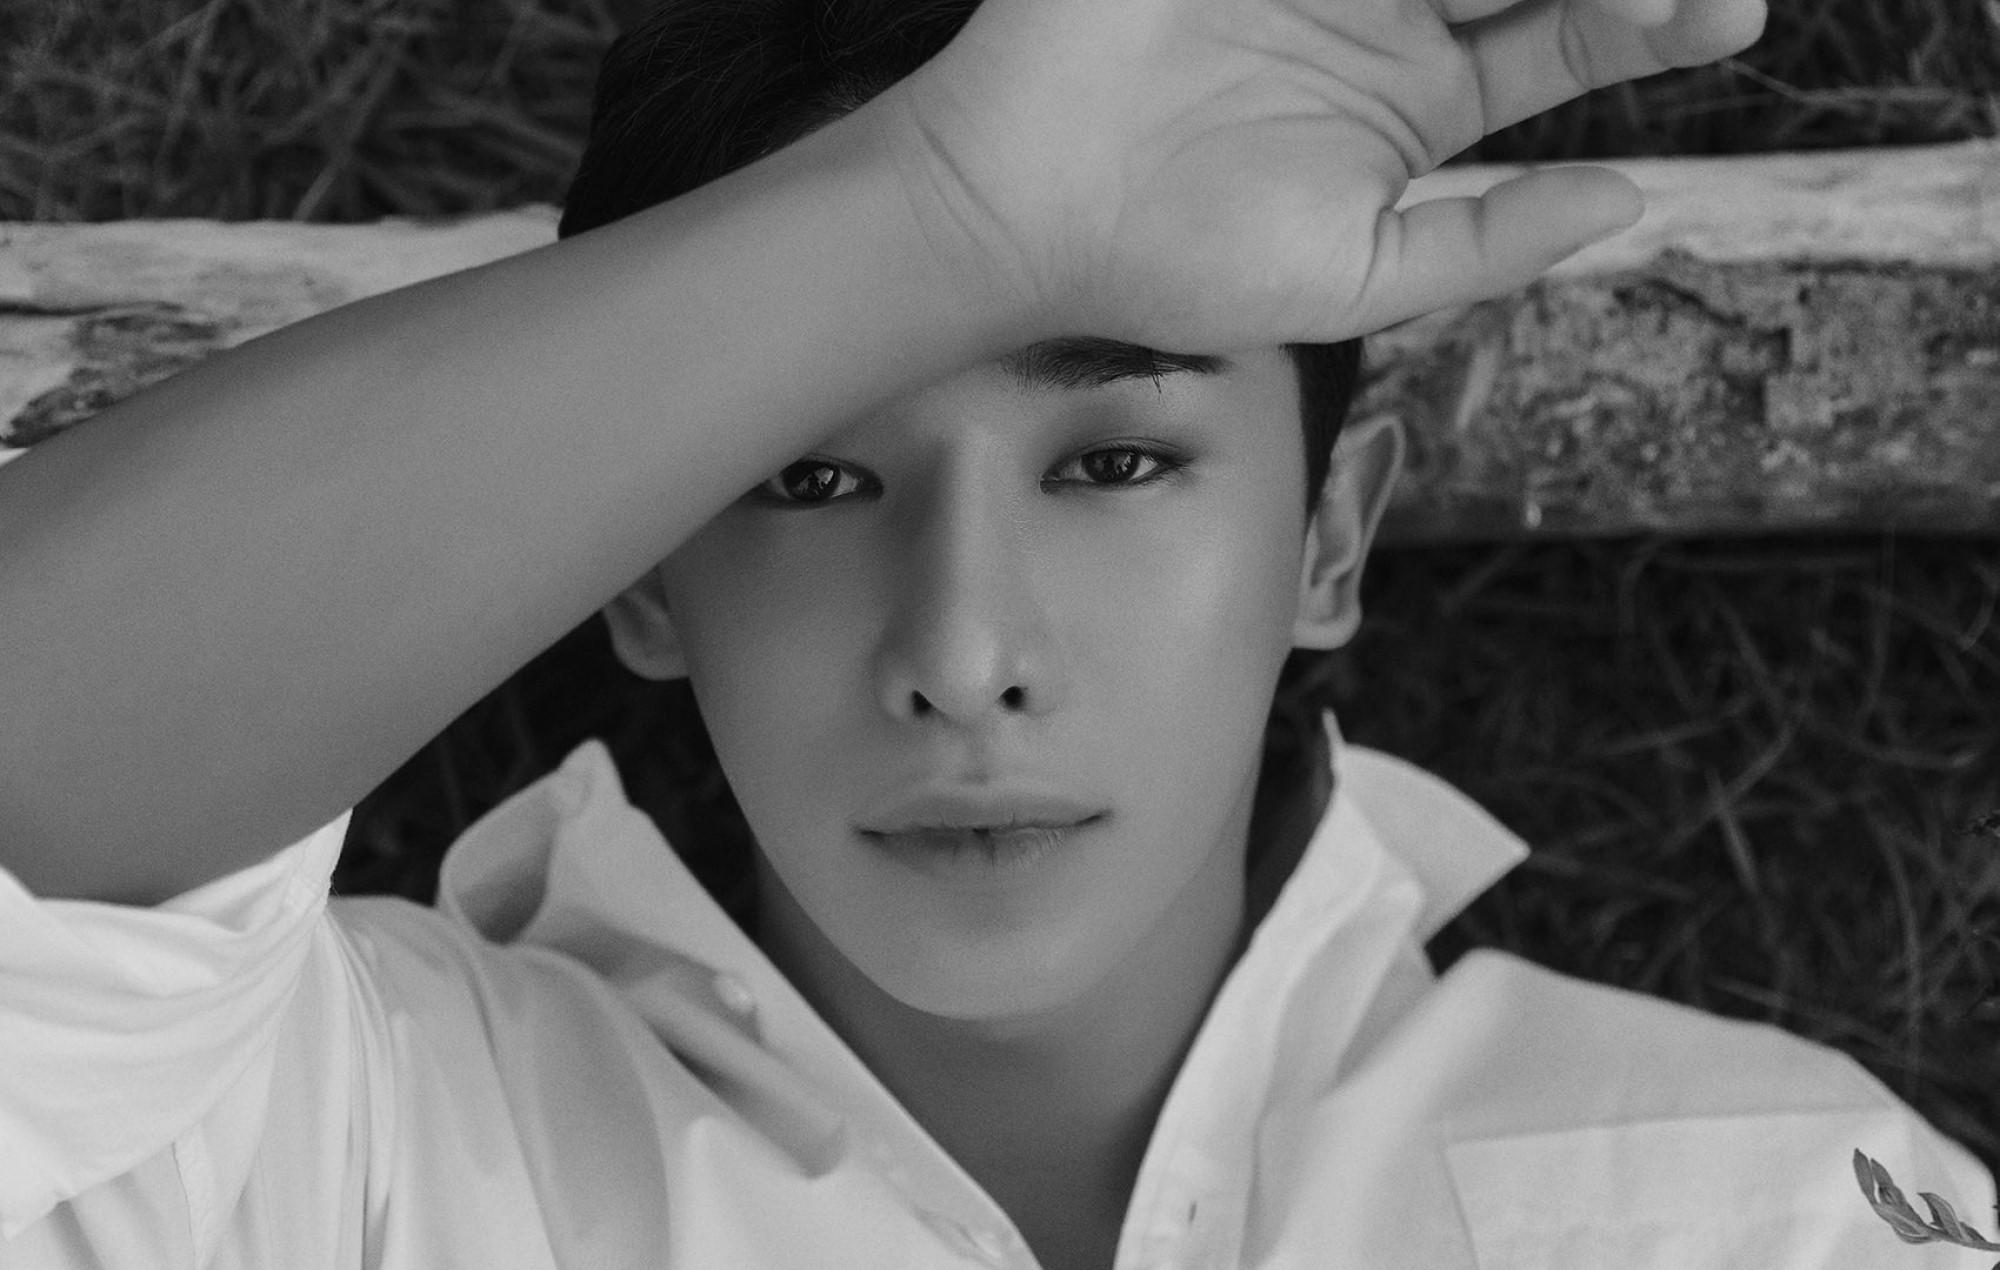 wonho blue letter interview release